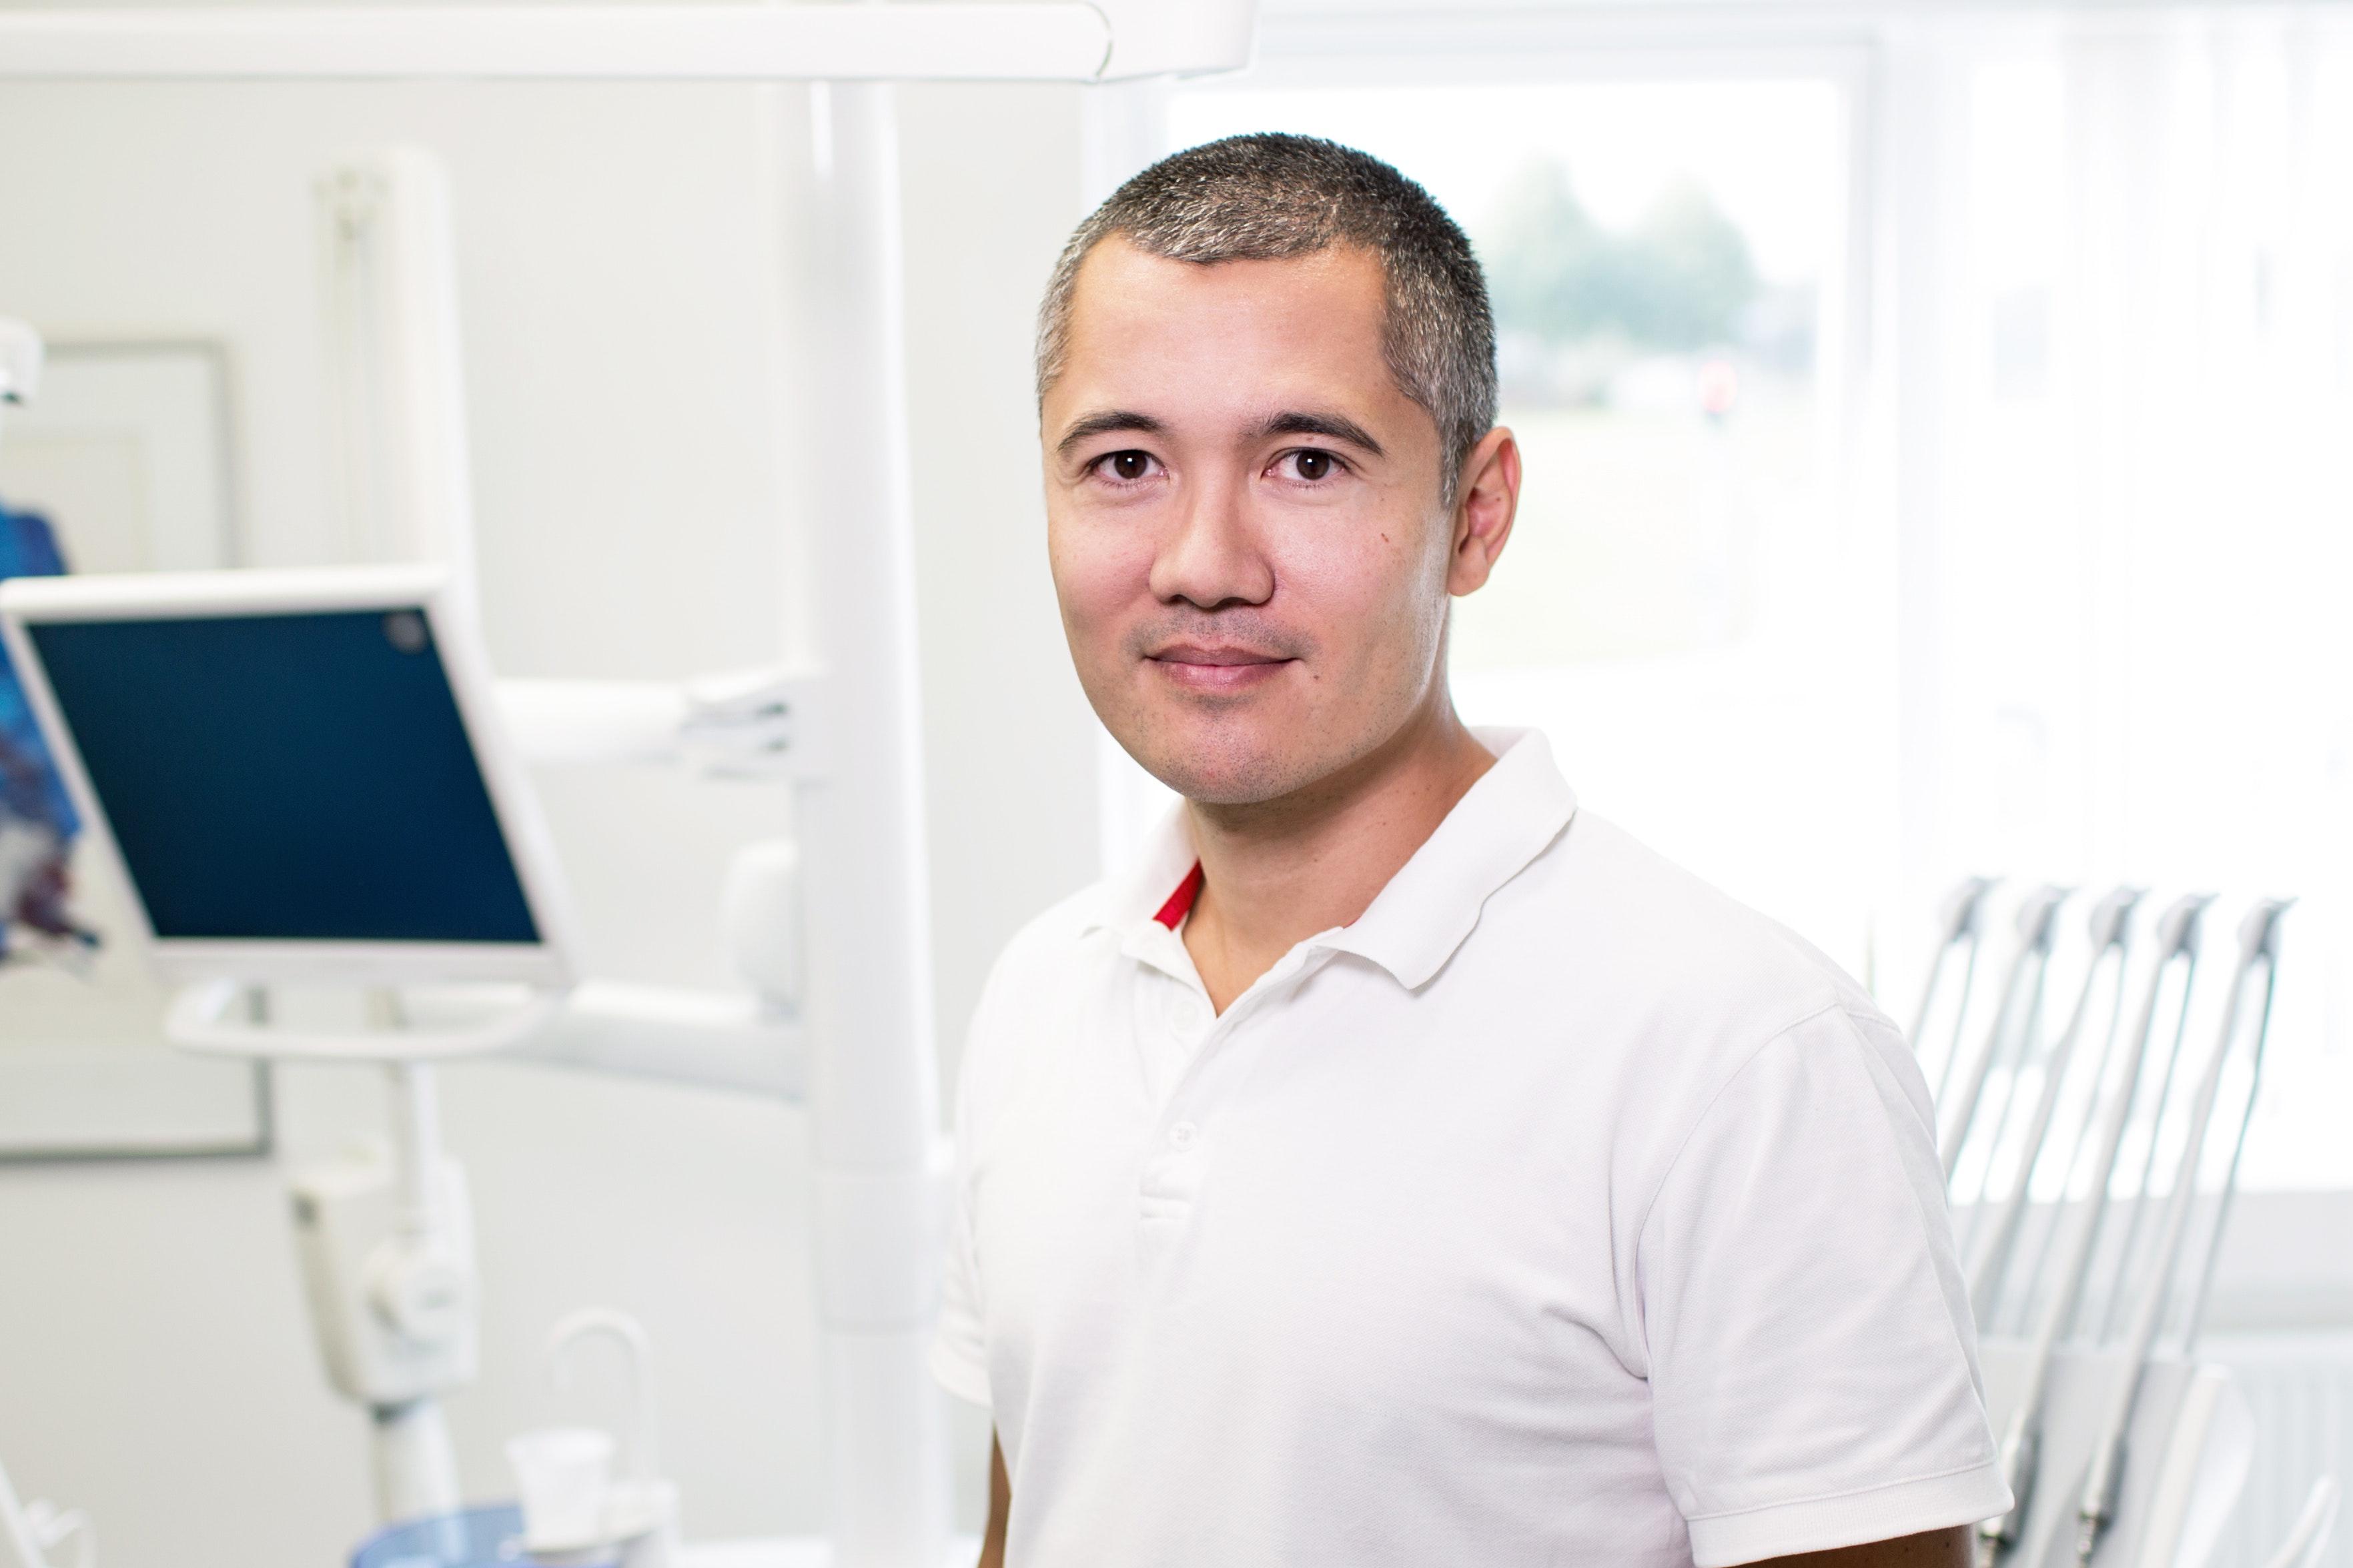 Portrait of Smiling Man, Adult, Indoors, Room, Portrait, HQ Photo